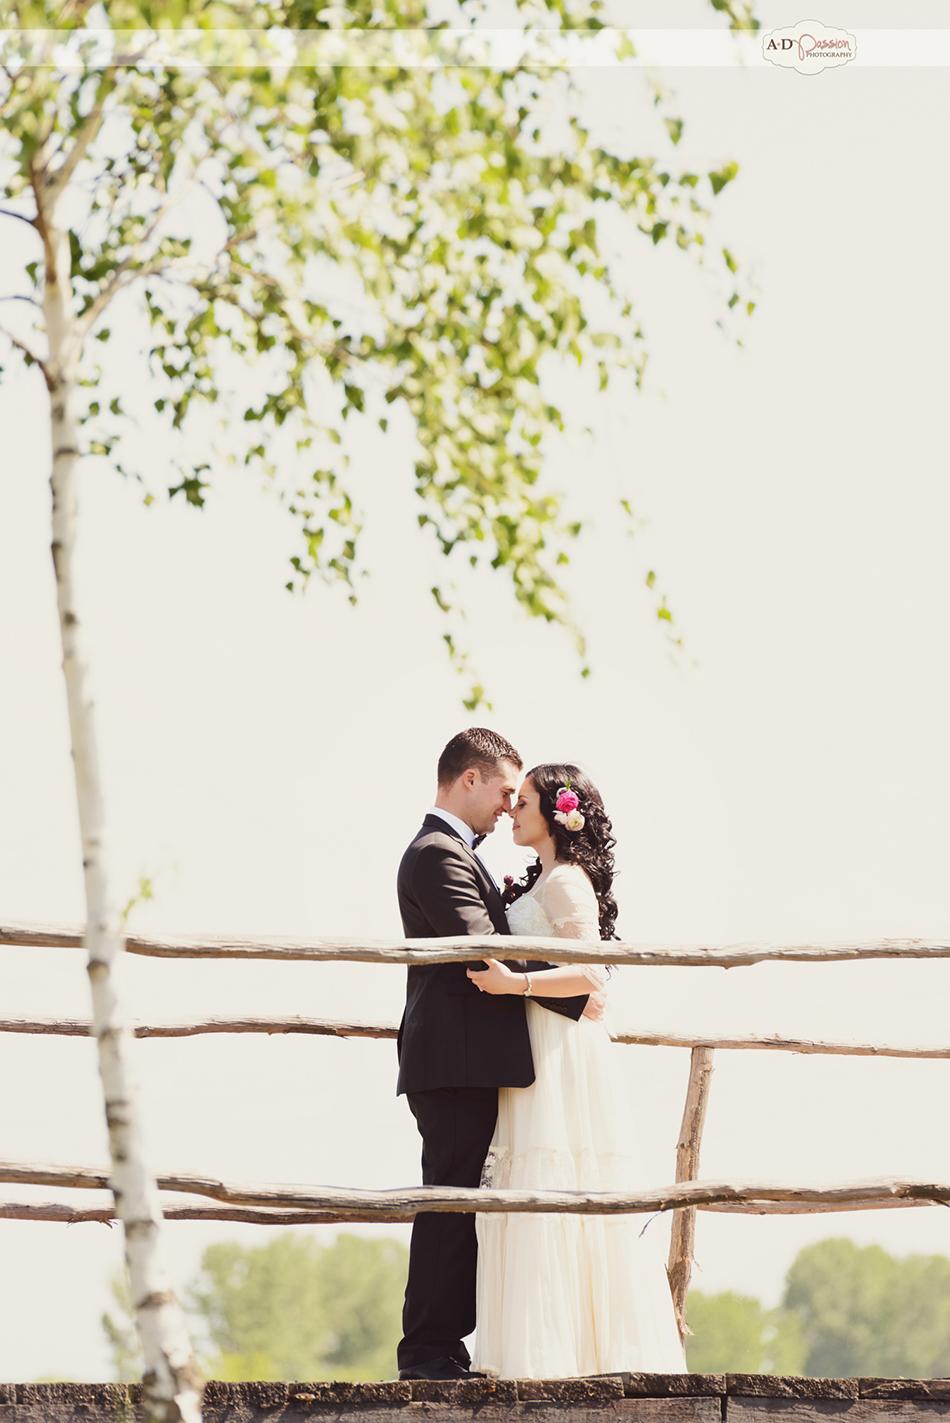 AD Passion Photography | 20140428_fotograf-nunta-timisoara_cristina_si_emanuel_0075 | Adelin, Dida, fotograf profesionist, fotograf de nunta, fotografie de nunta, fotograf Timisoara, fotograf Craiova, fotograf Bucuresti, fotograf Arad, nunta Timisoara, nunta Arad, nunta Bucuresti, nunta Craiova